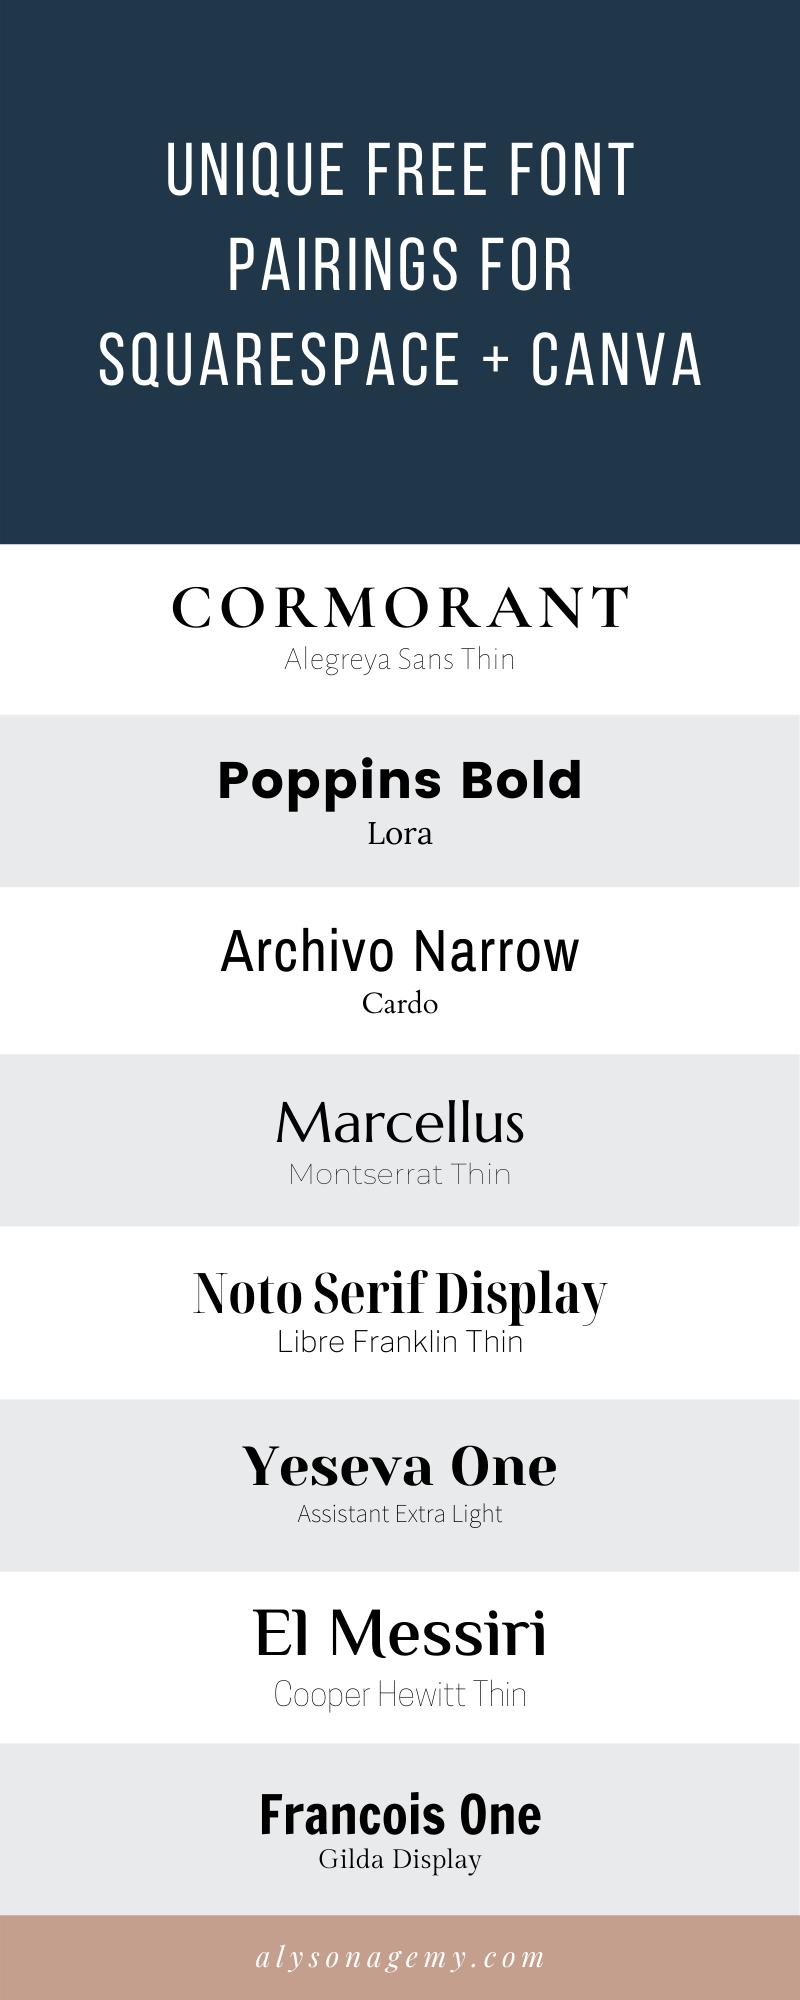 Unique Free Font Pairings For Squarespace Canva Alyson Agemy Graphic Web Design For Creative In 2020 Font Pairing Web Design Font Google Font Pairings